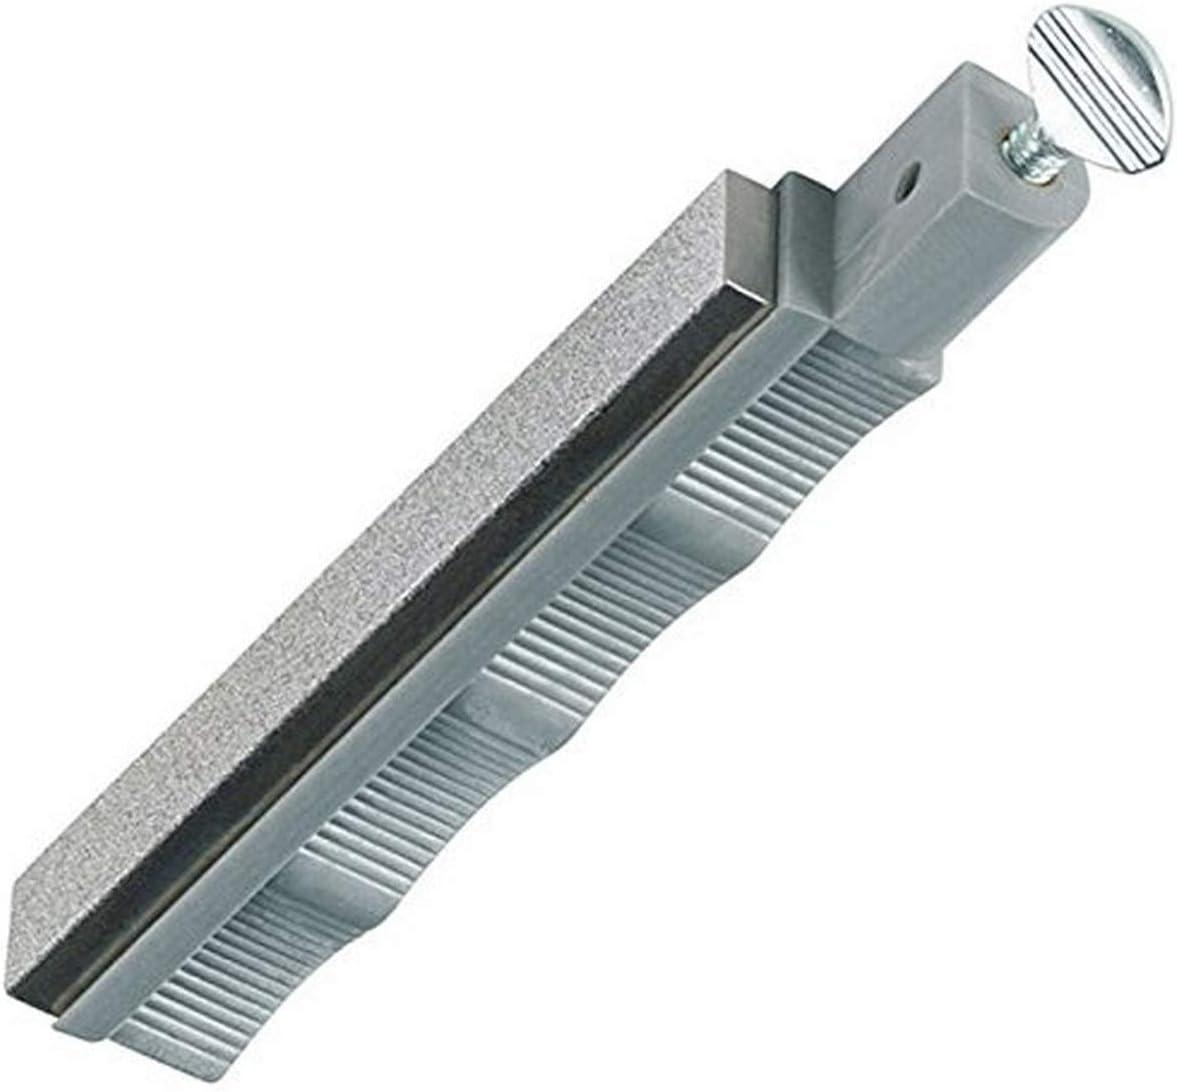 Lansky Sharpening Hone LDHXC Extra coarse diamond-fastest cutting diamond hone,